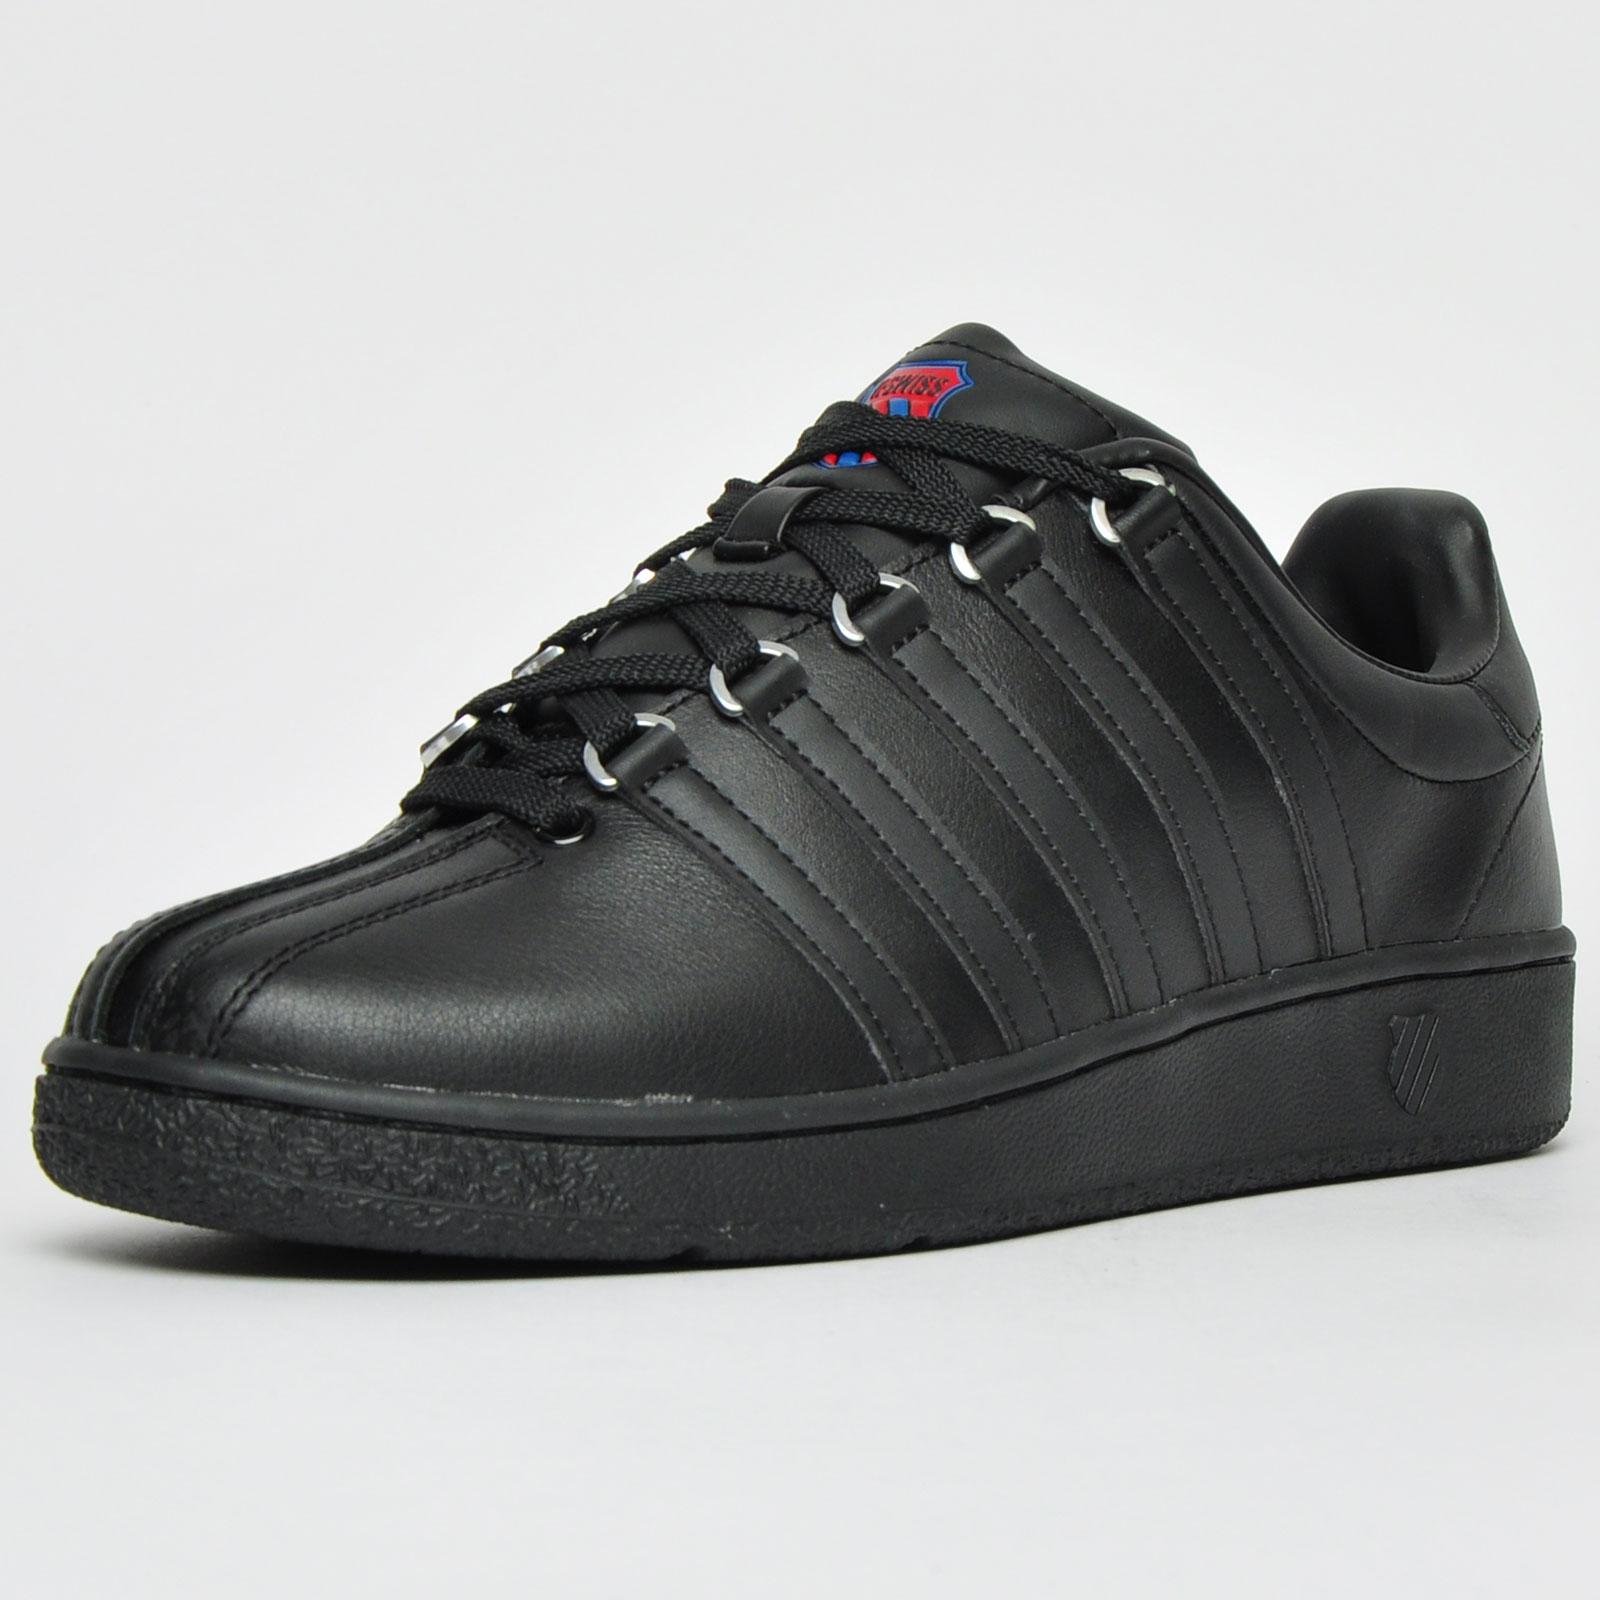 K Swiss Classic Vintage Heritage Men s Leather Casual Classic Retro Trainers  Black 58beaa1c8